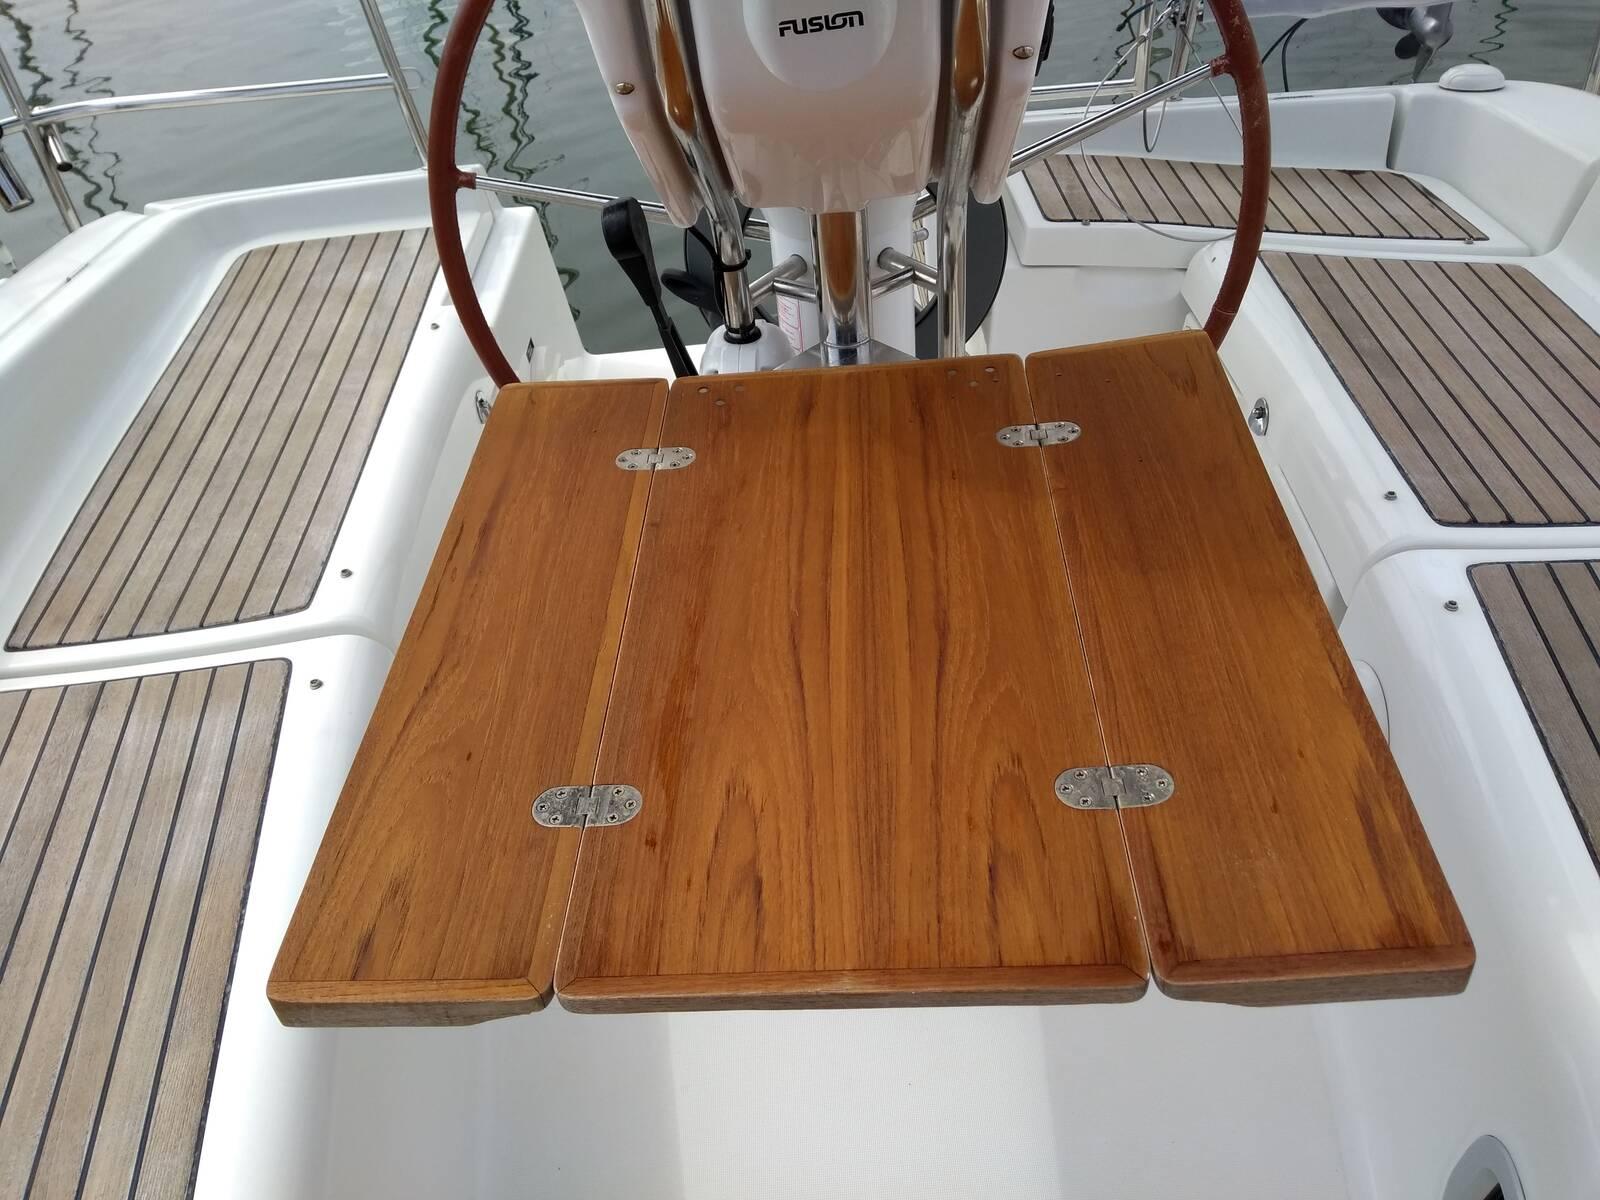 Beneteau Oceanis 343 cockpit table